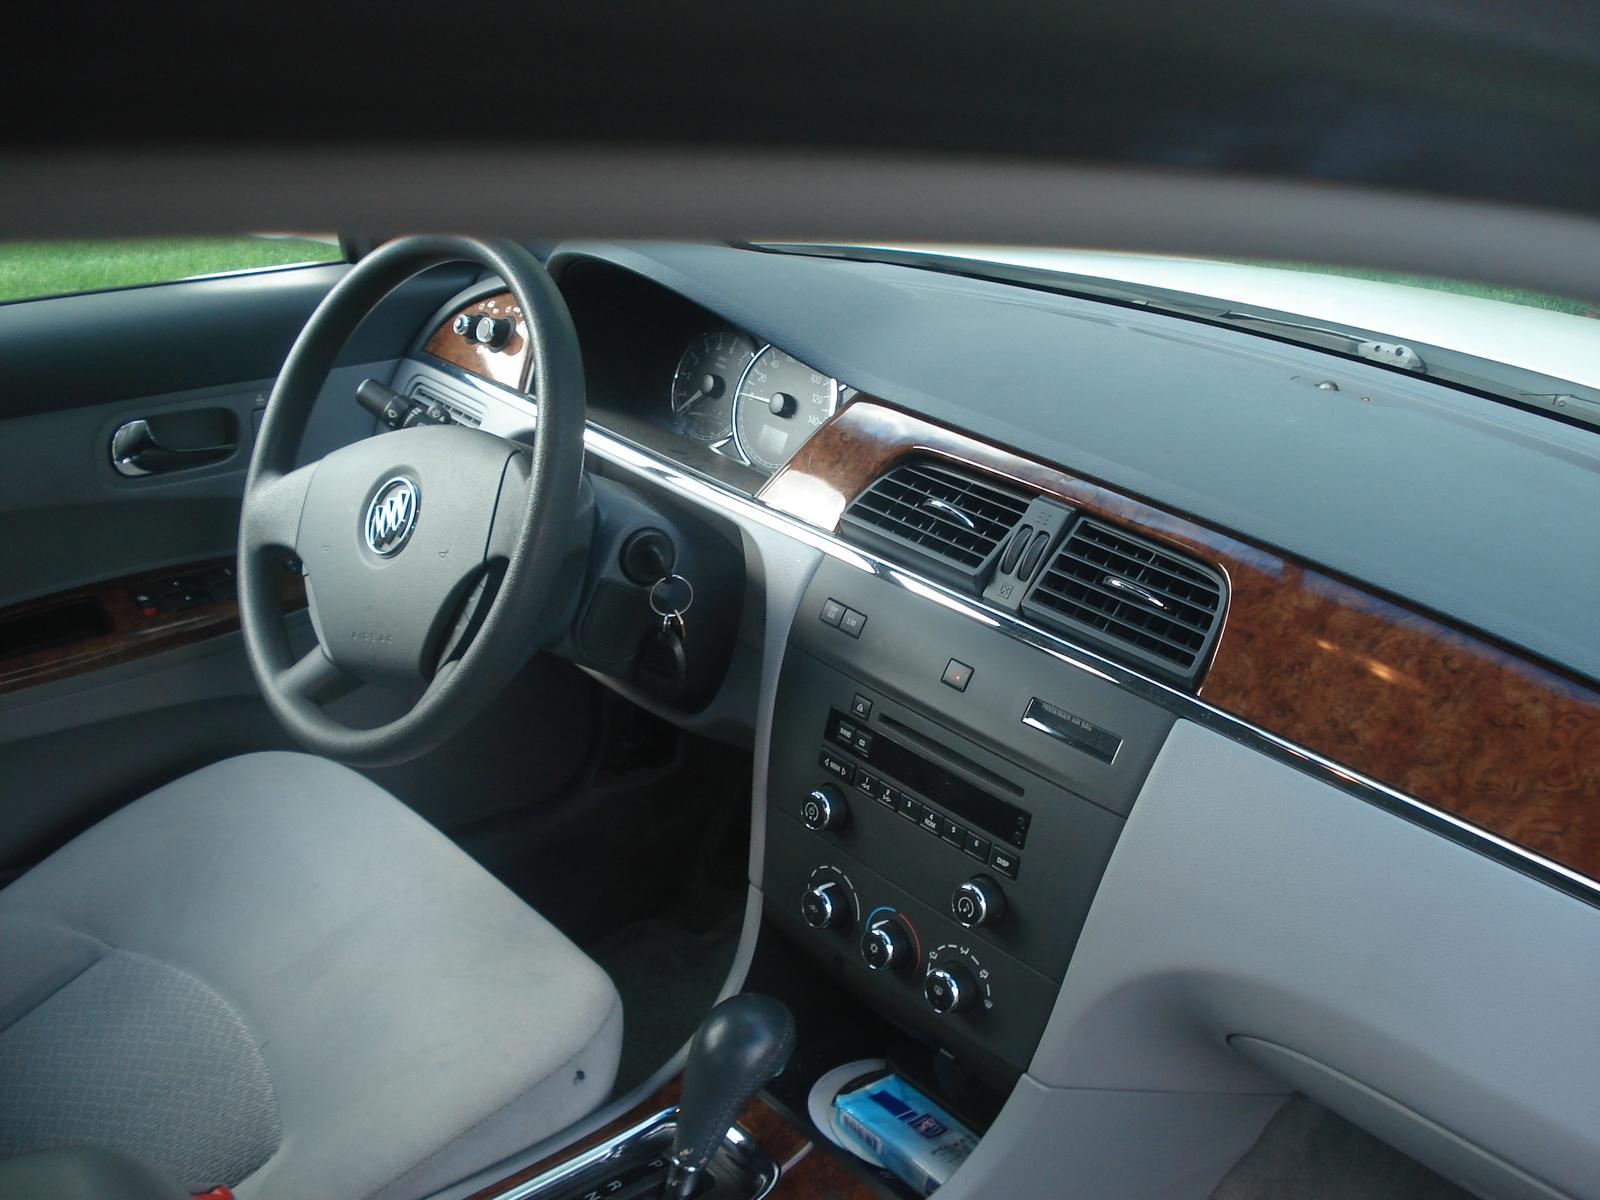 Buick Lacrosse Cx Pic on 2007 Buick Lacrosse Cxl Interior